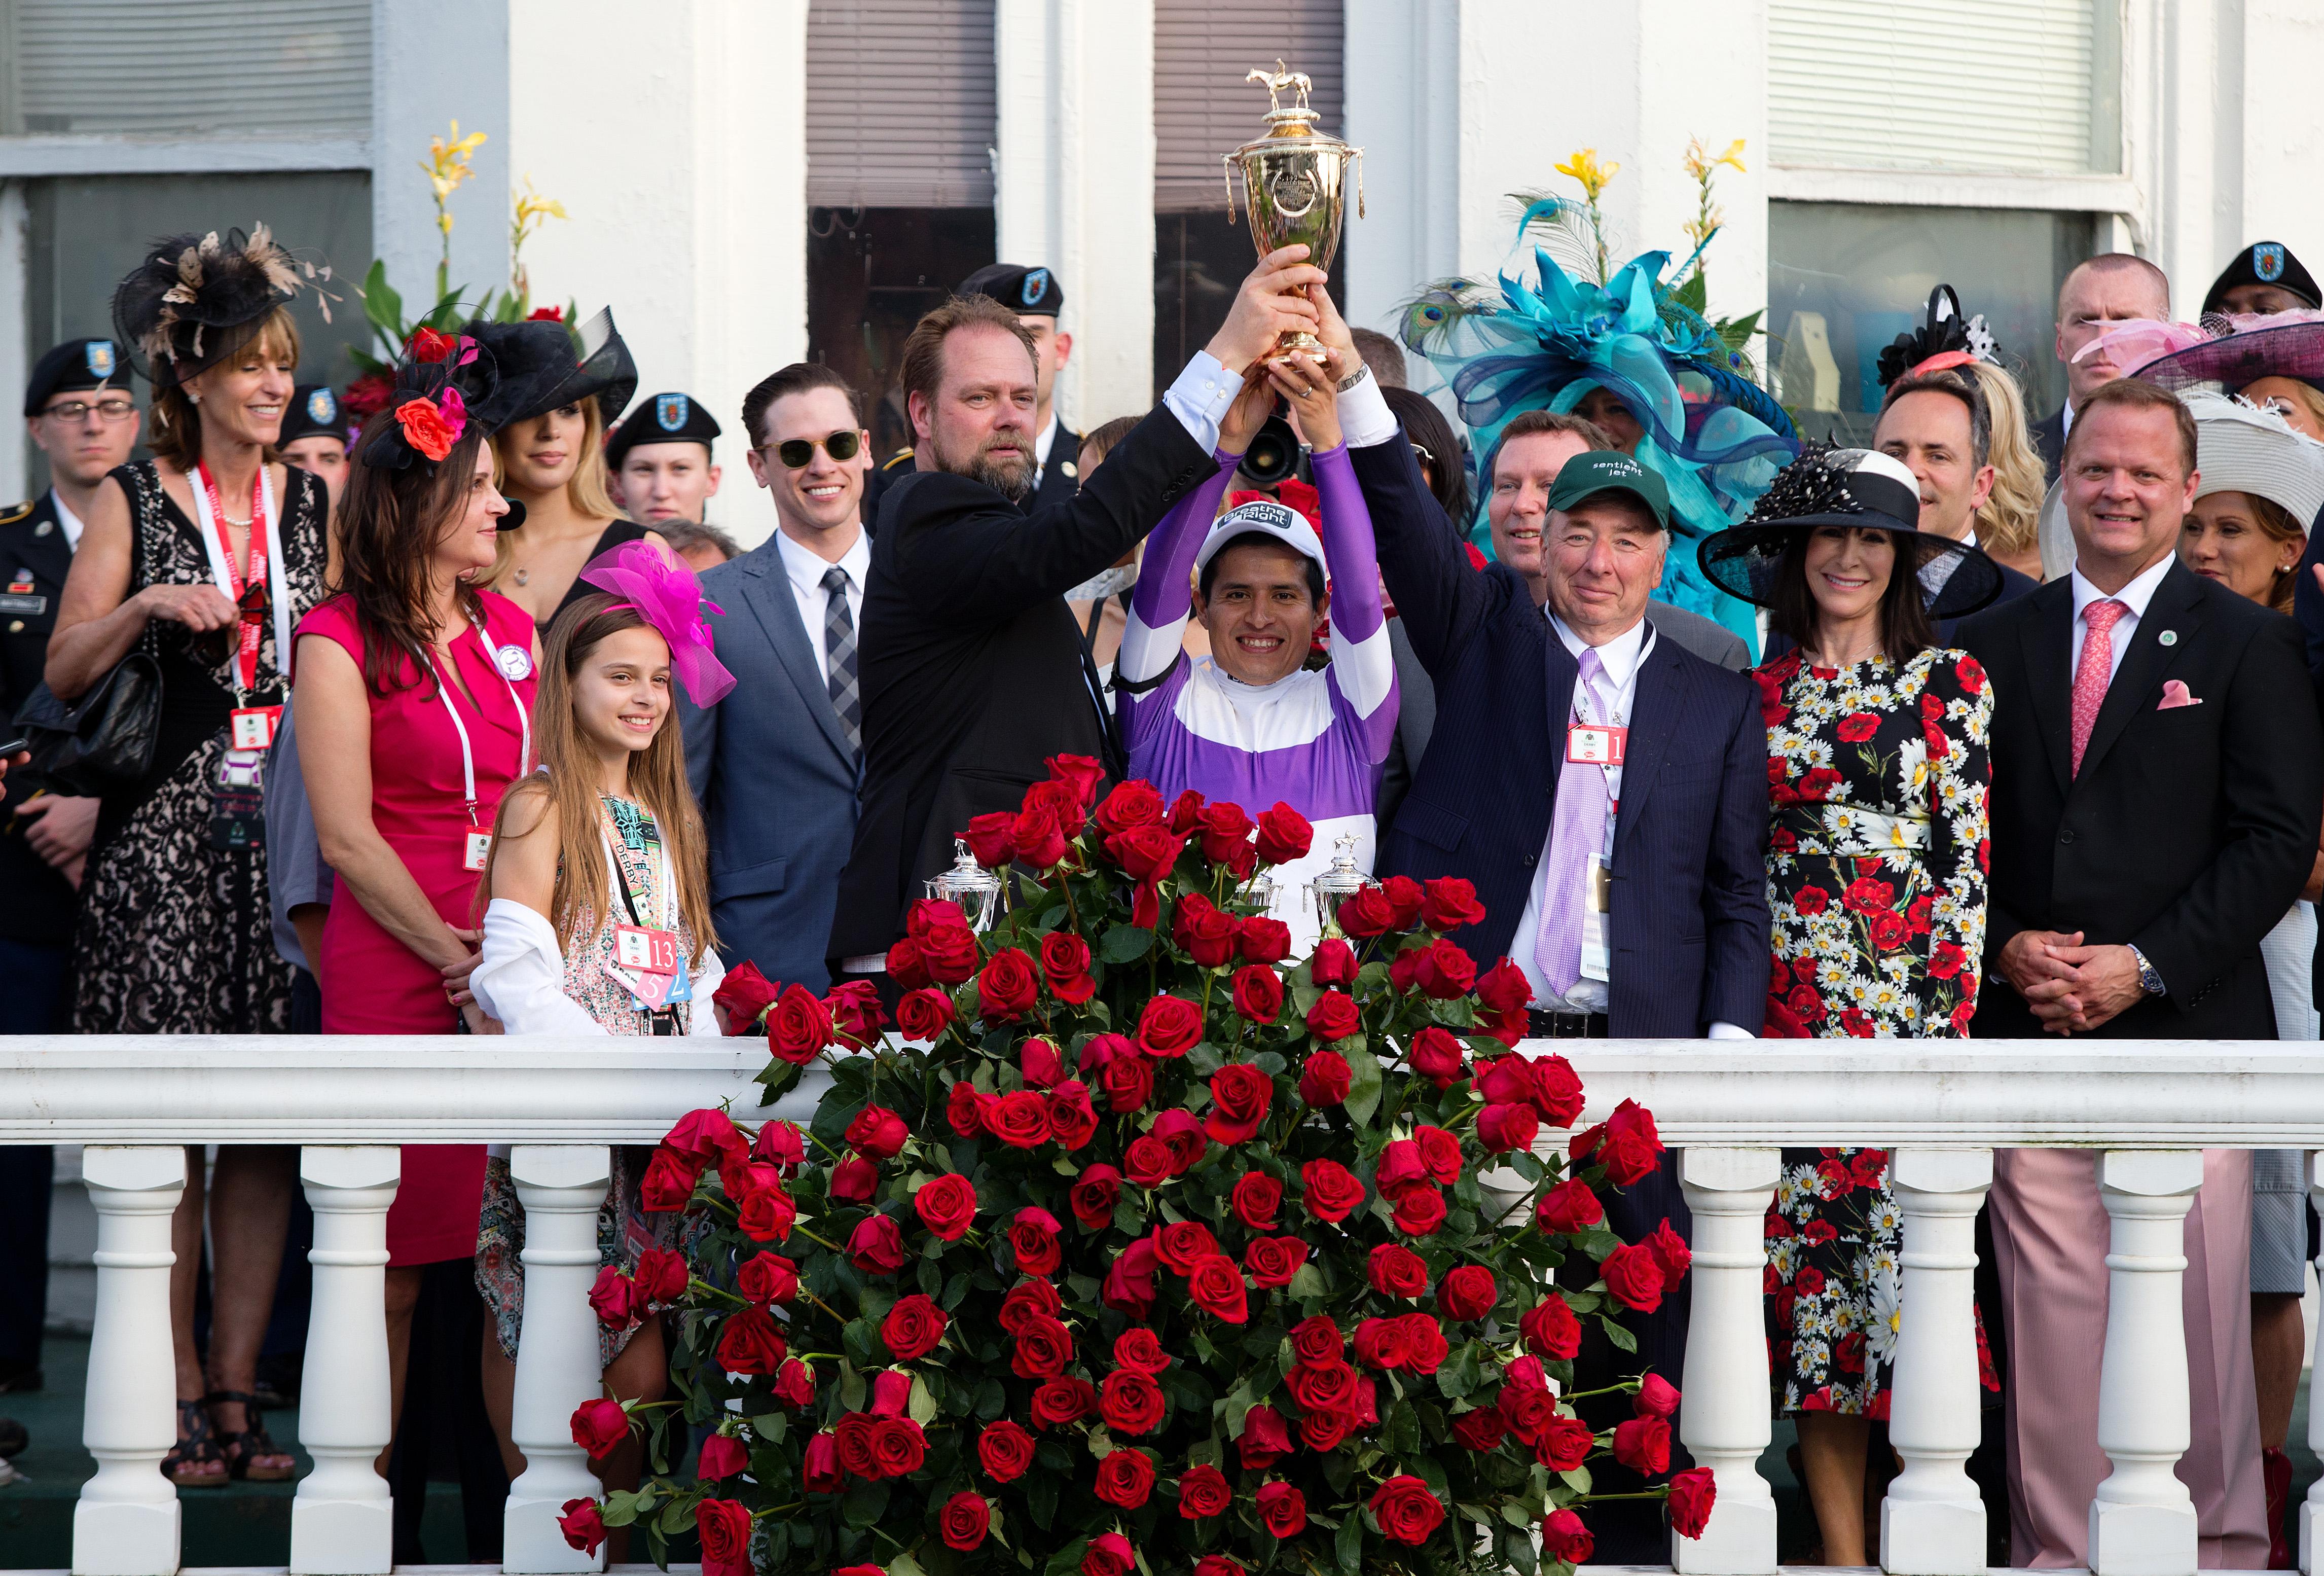 Trainer Doug O'Neill, jockey Mario Gutierrez and owner Paul Reddam celebrate their victory,